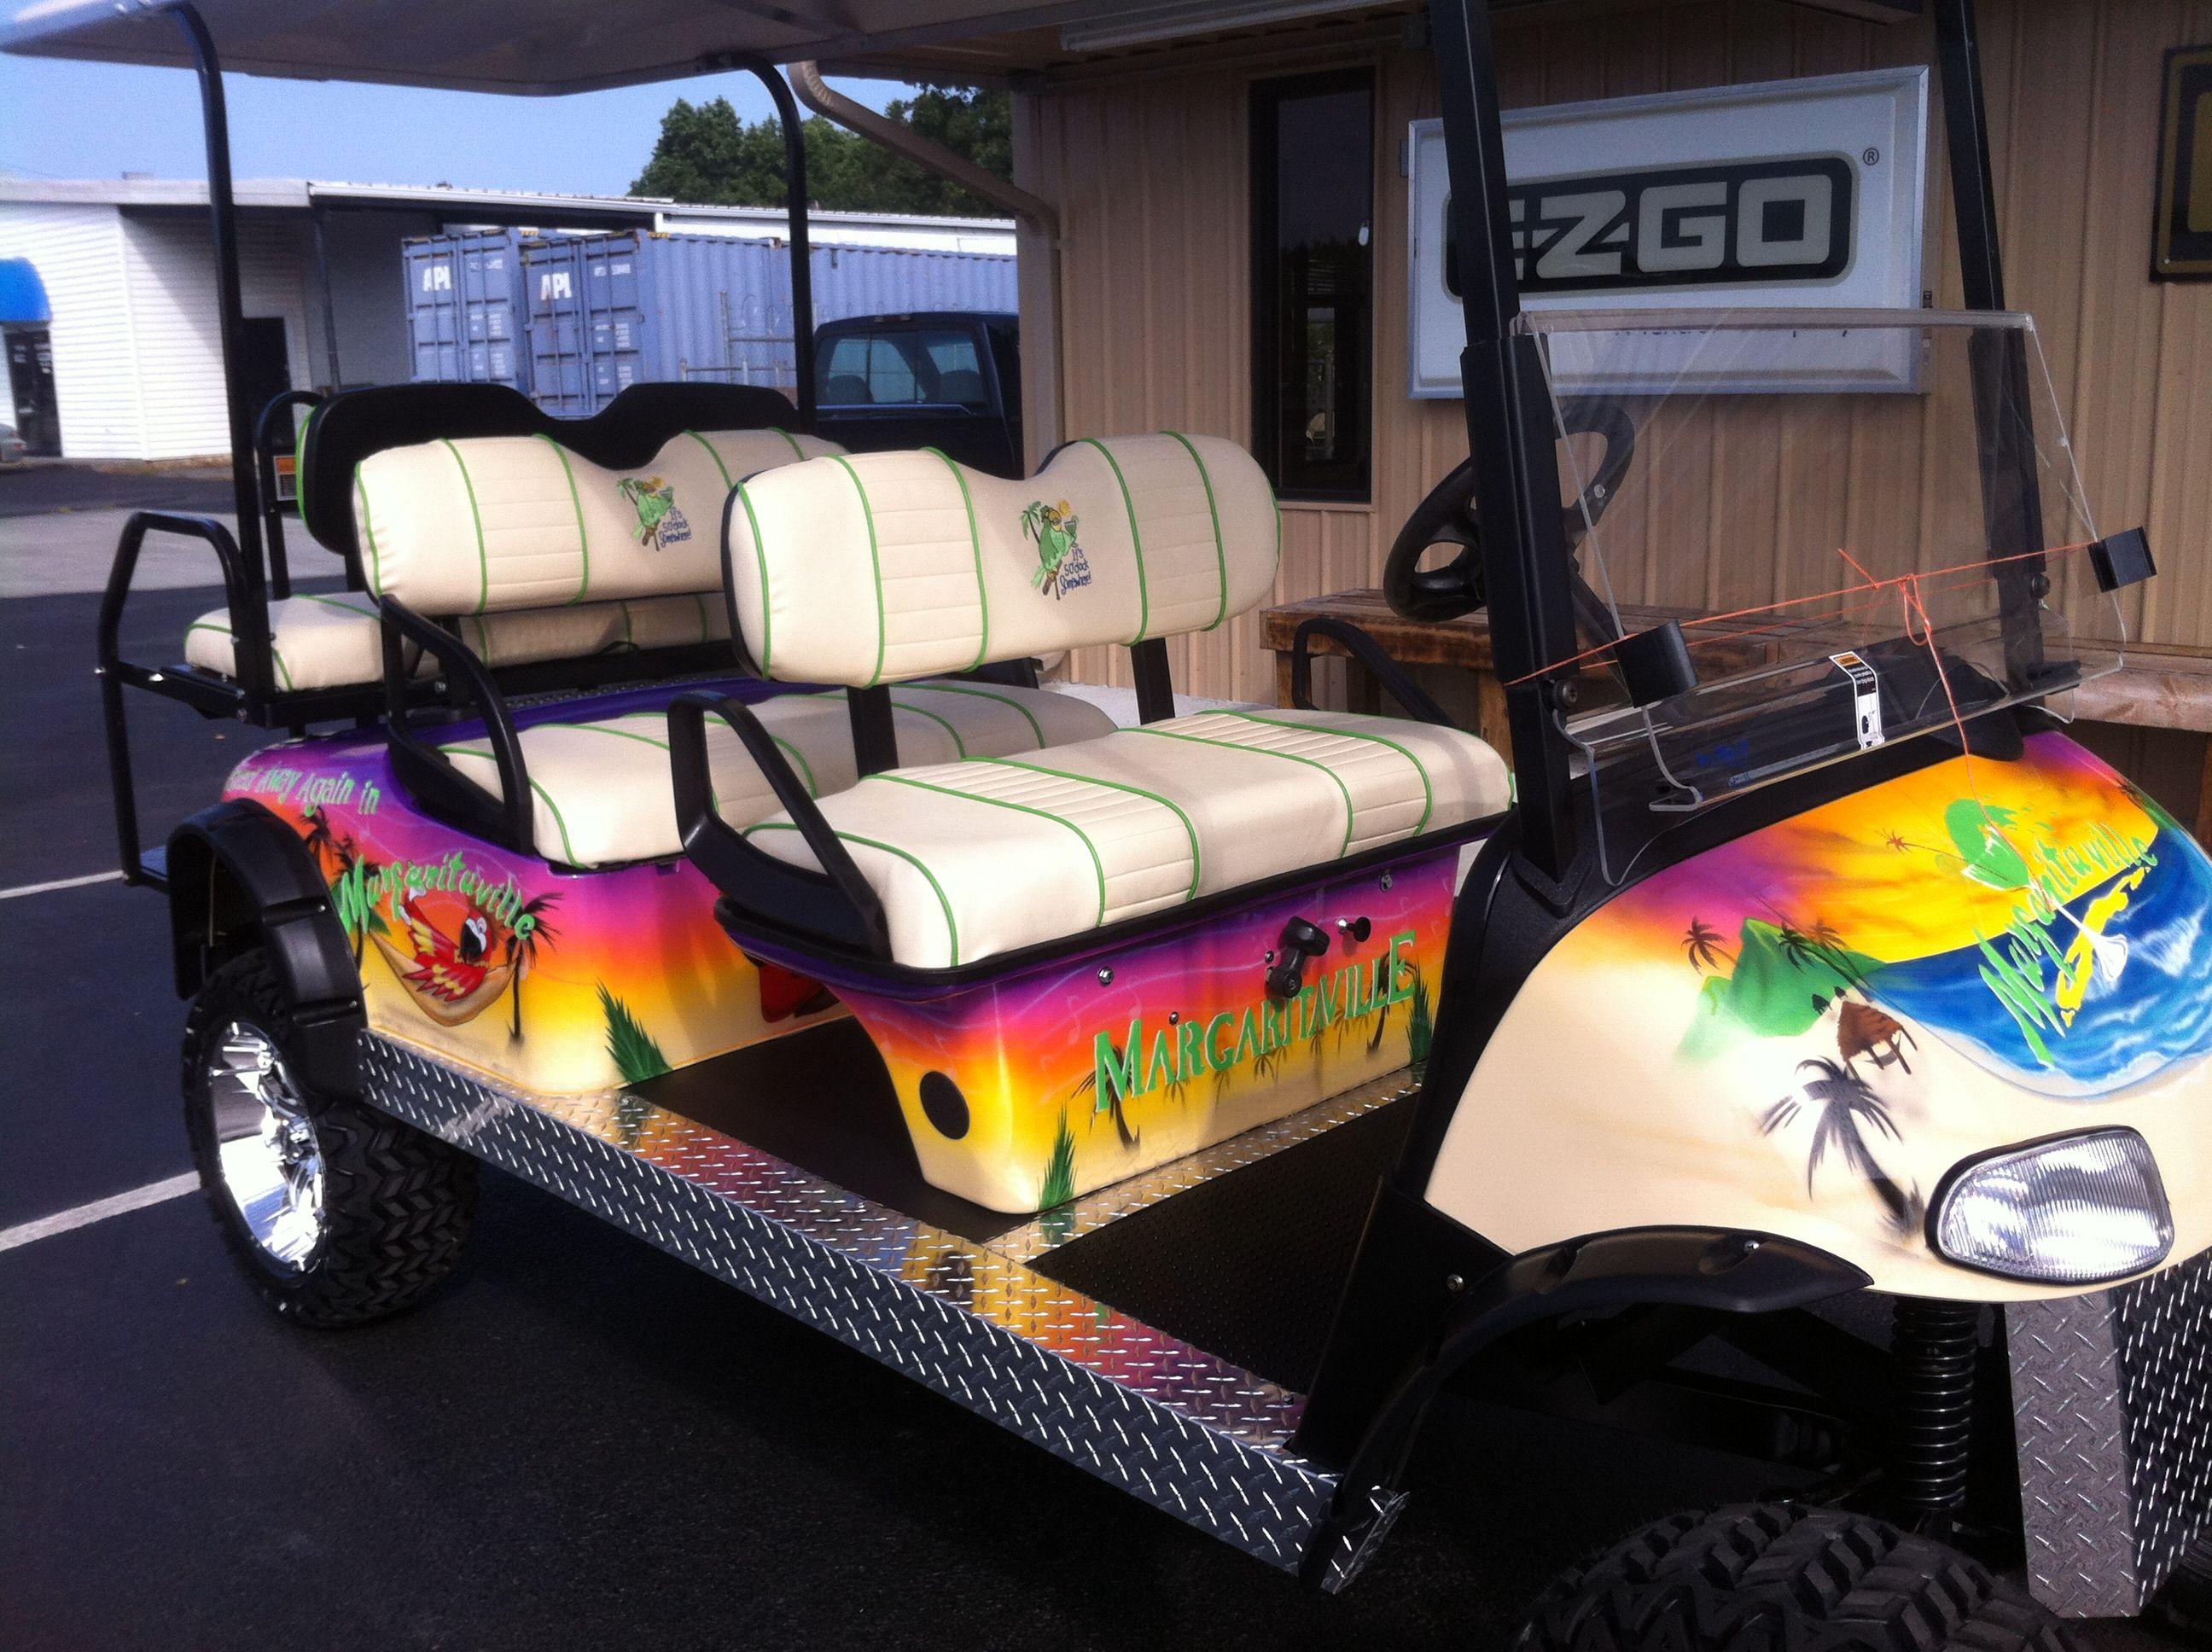 Metrolina Carts Custom Golf Carts Margaritaville Inspired ...  |Margaritaville Golf Cart Craigslist